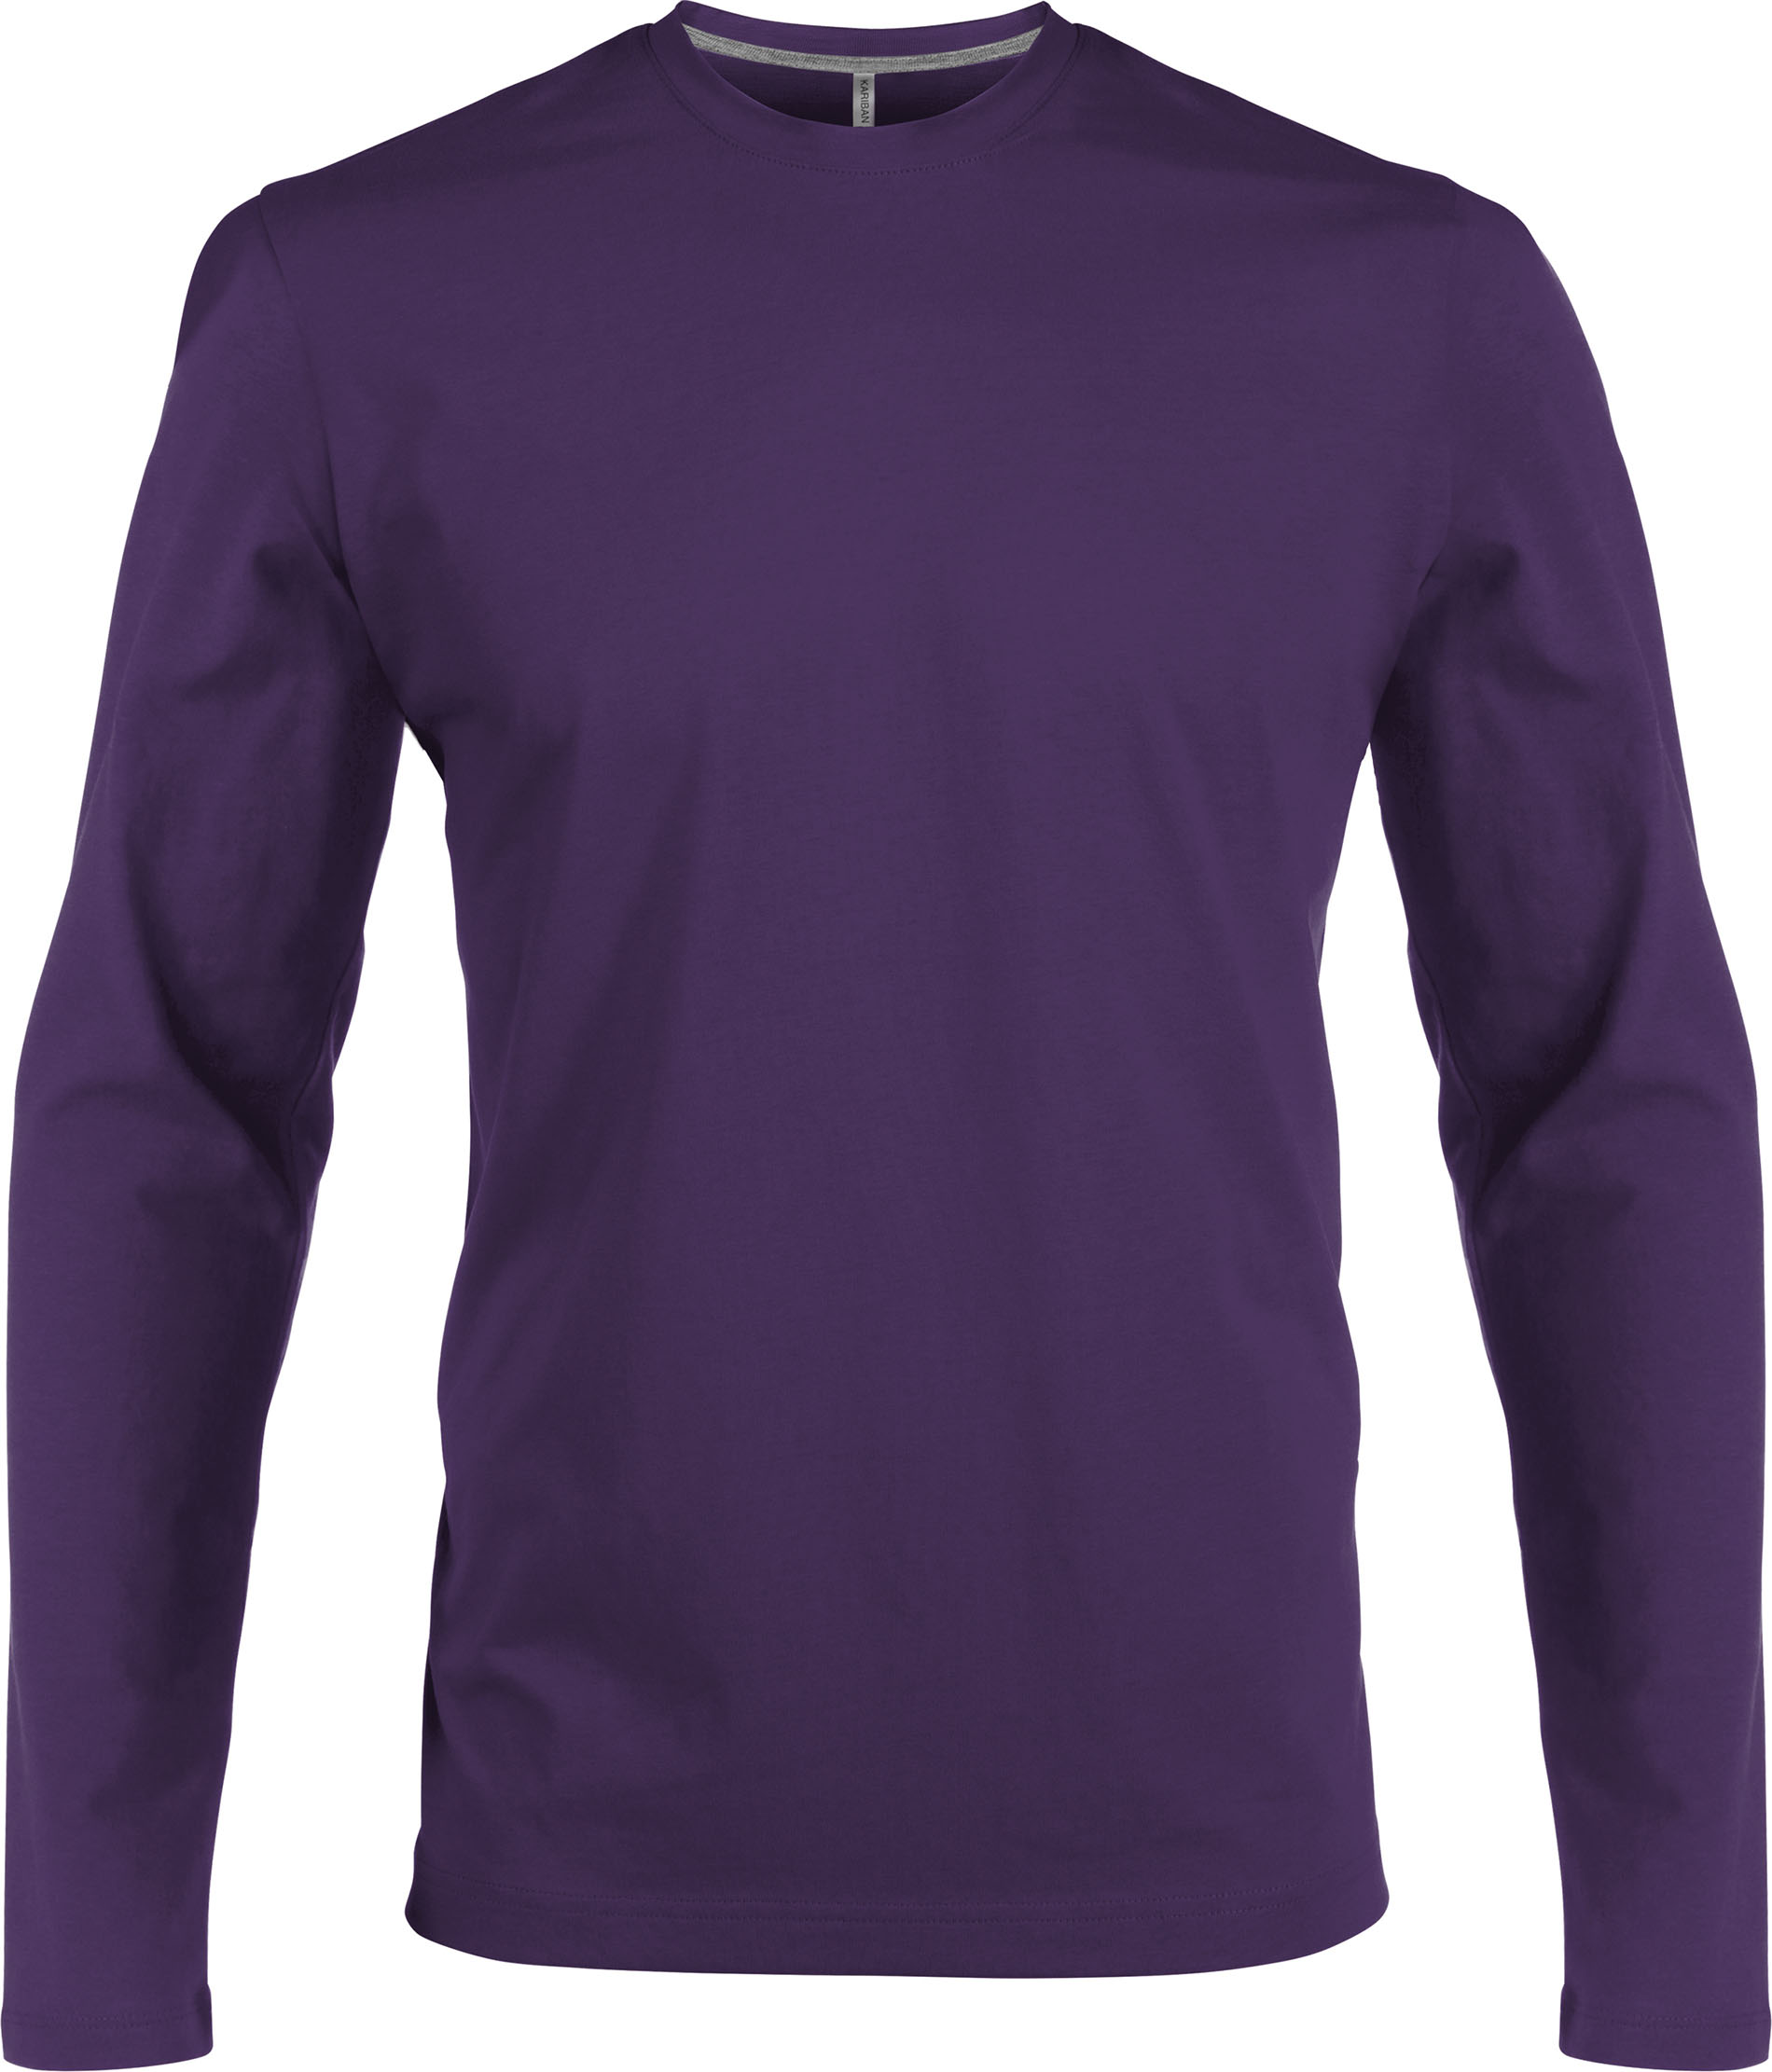 T-paita K359 O-aukko PH Violetti